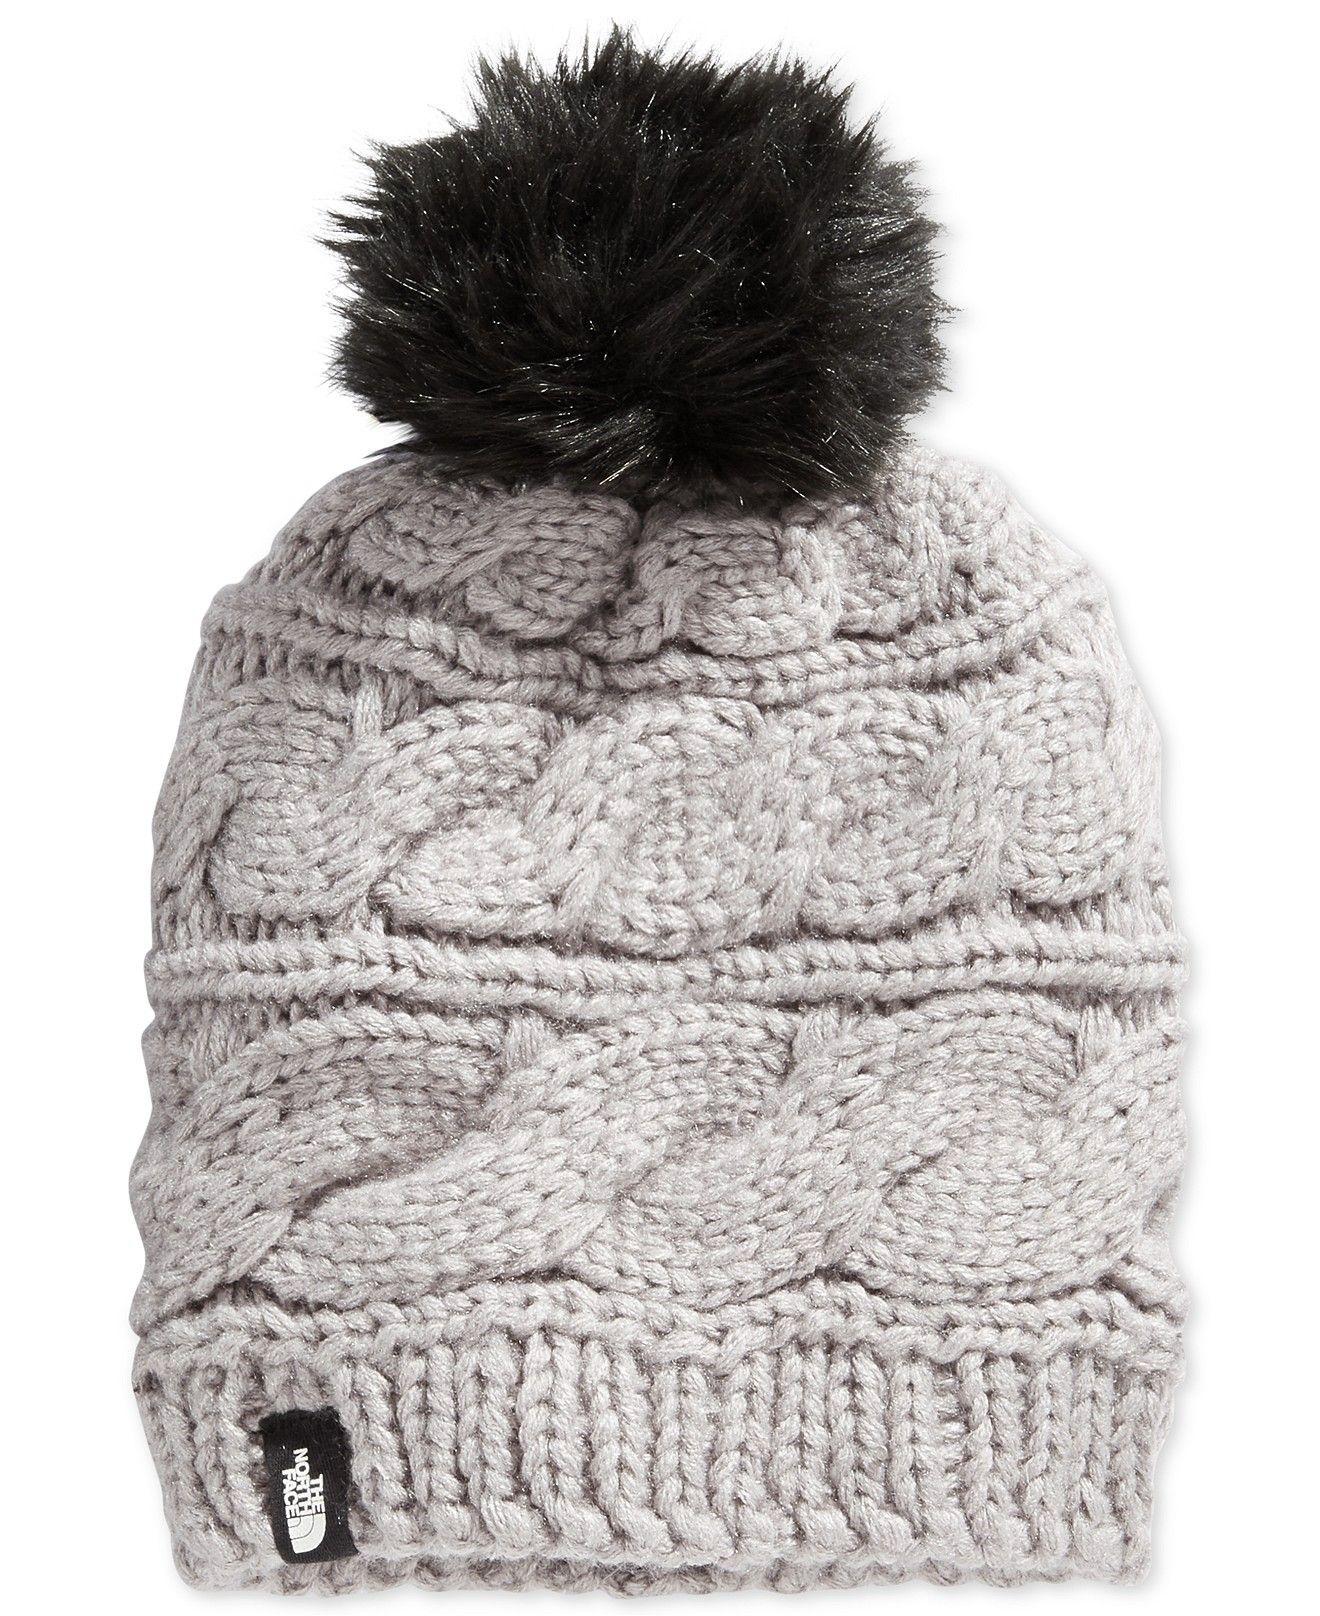 6aa266fcc The North Face Faux-Fur-Trim Pom Pom Hat - Women - Macy's   fashion ...